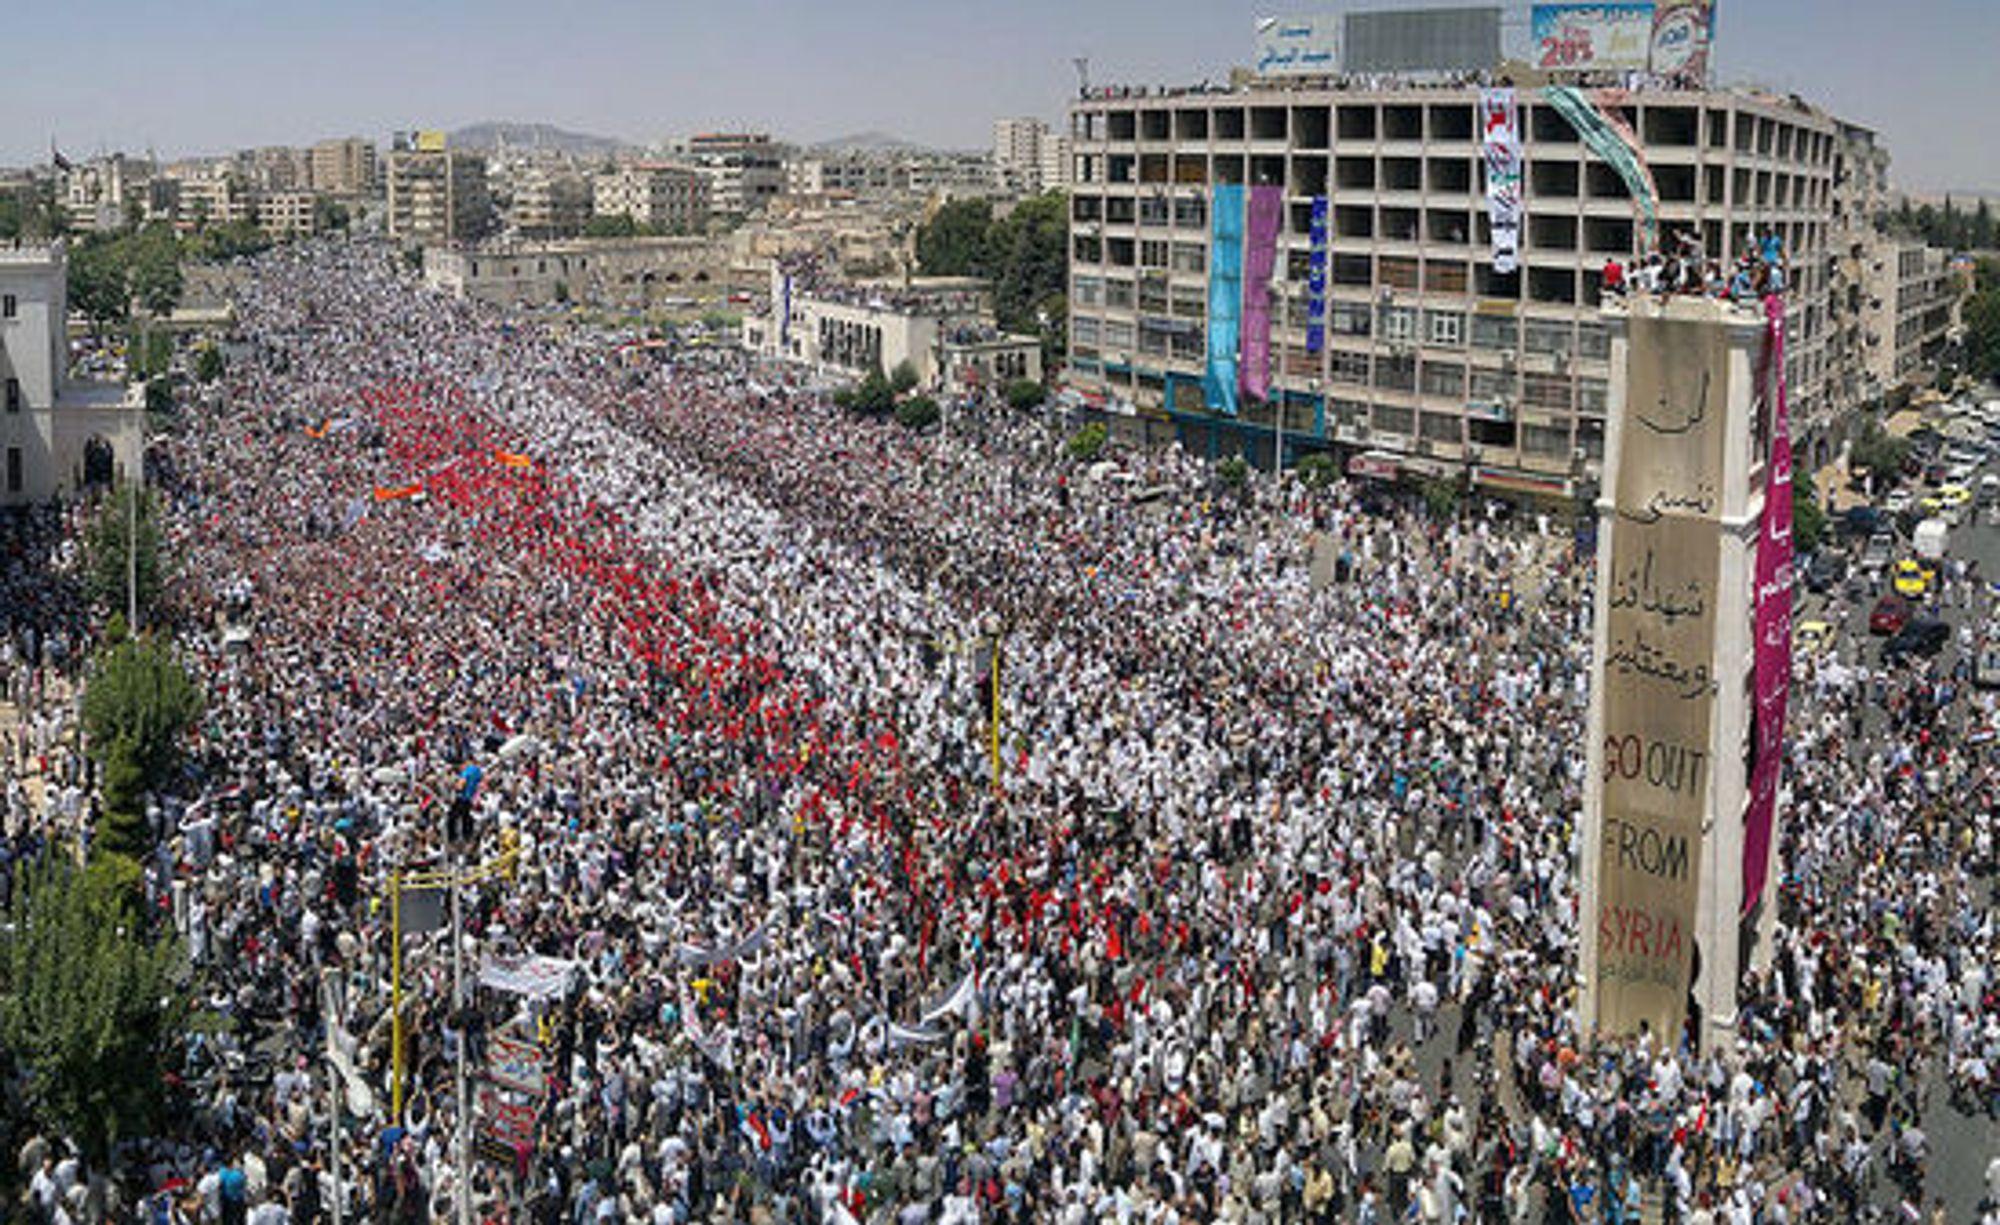 22. juli demonstrerte 700 000 i Al-Assy-plassen i Hama, mot Assad-regimet.